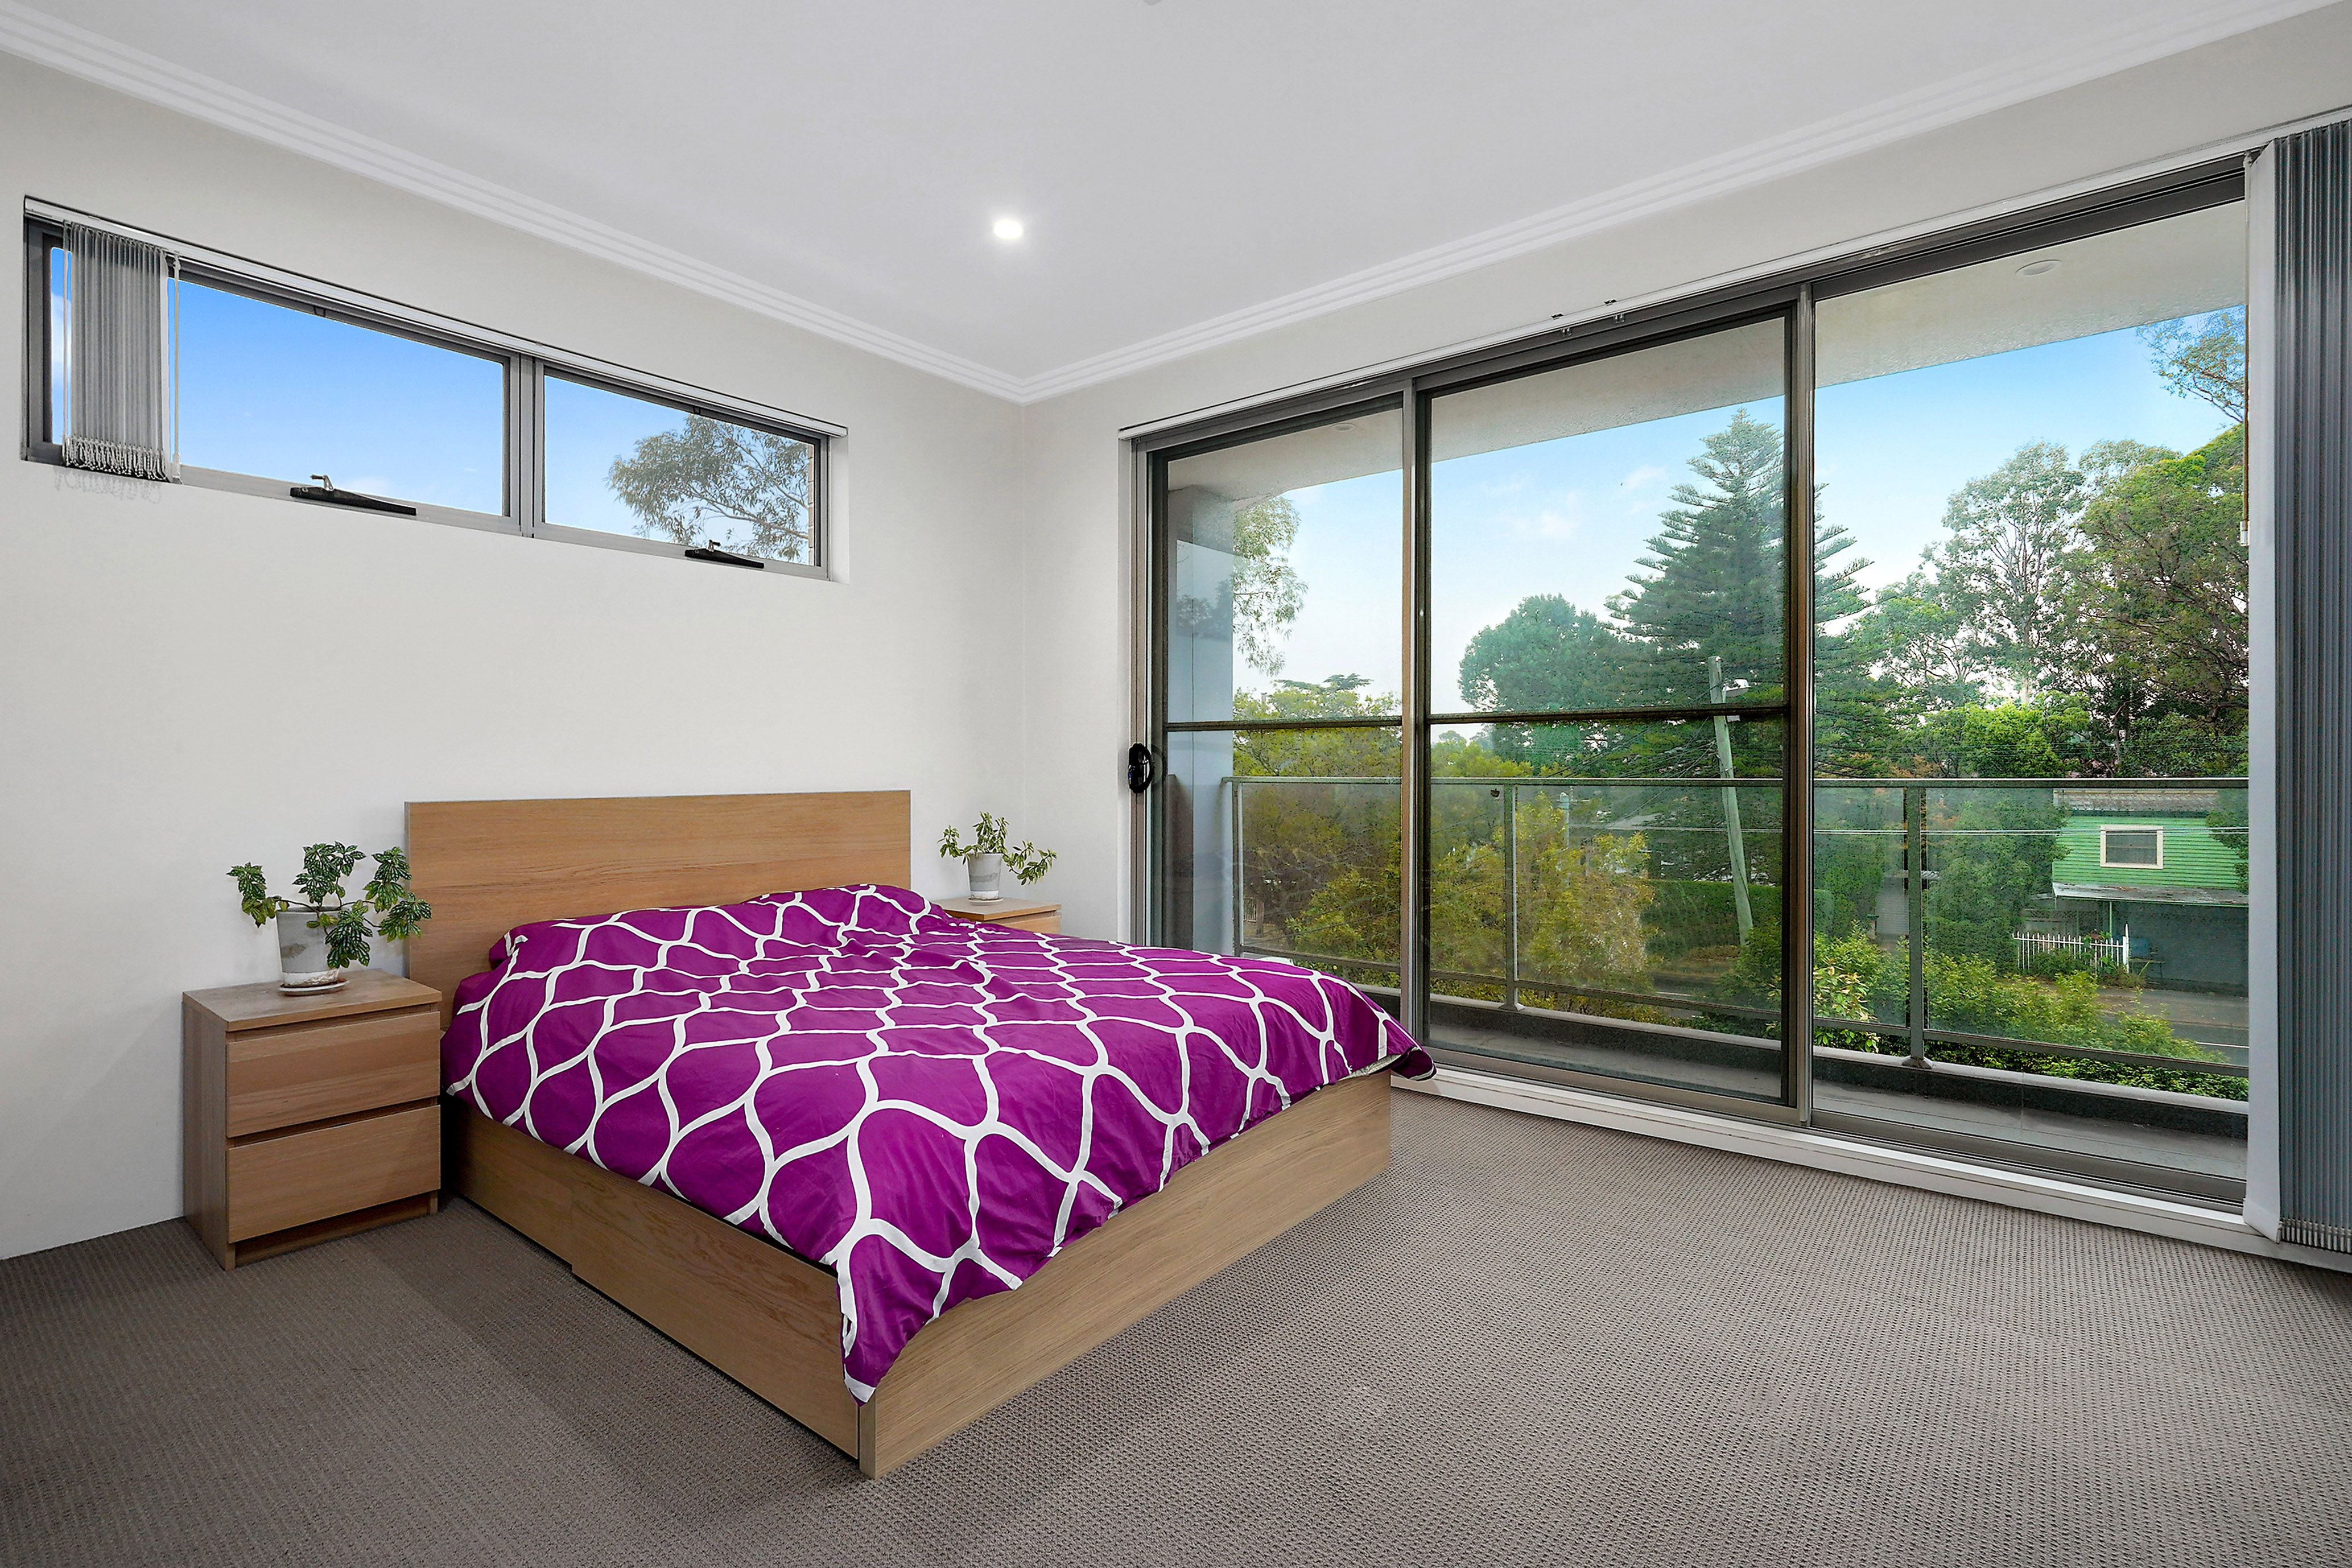 2/133 Birdwood Road, Georges Hall NSW 2198